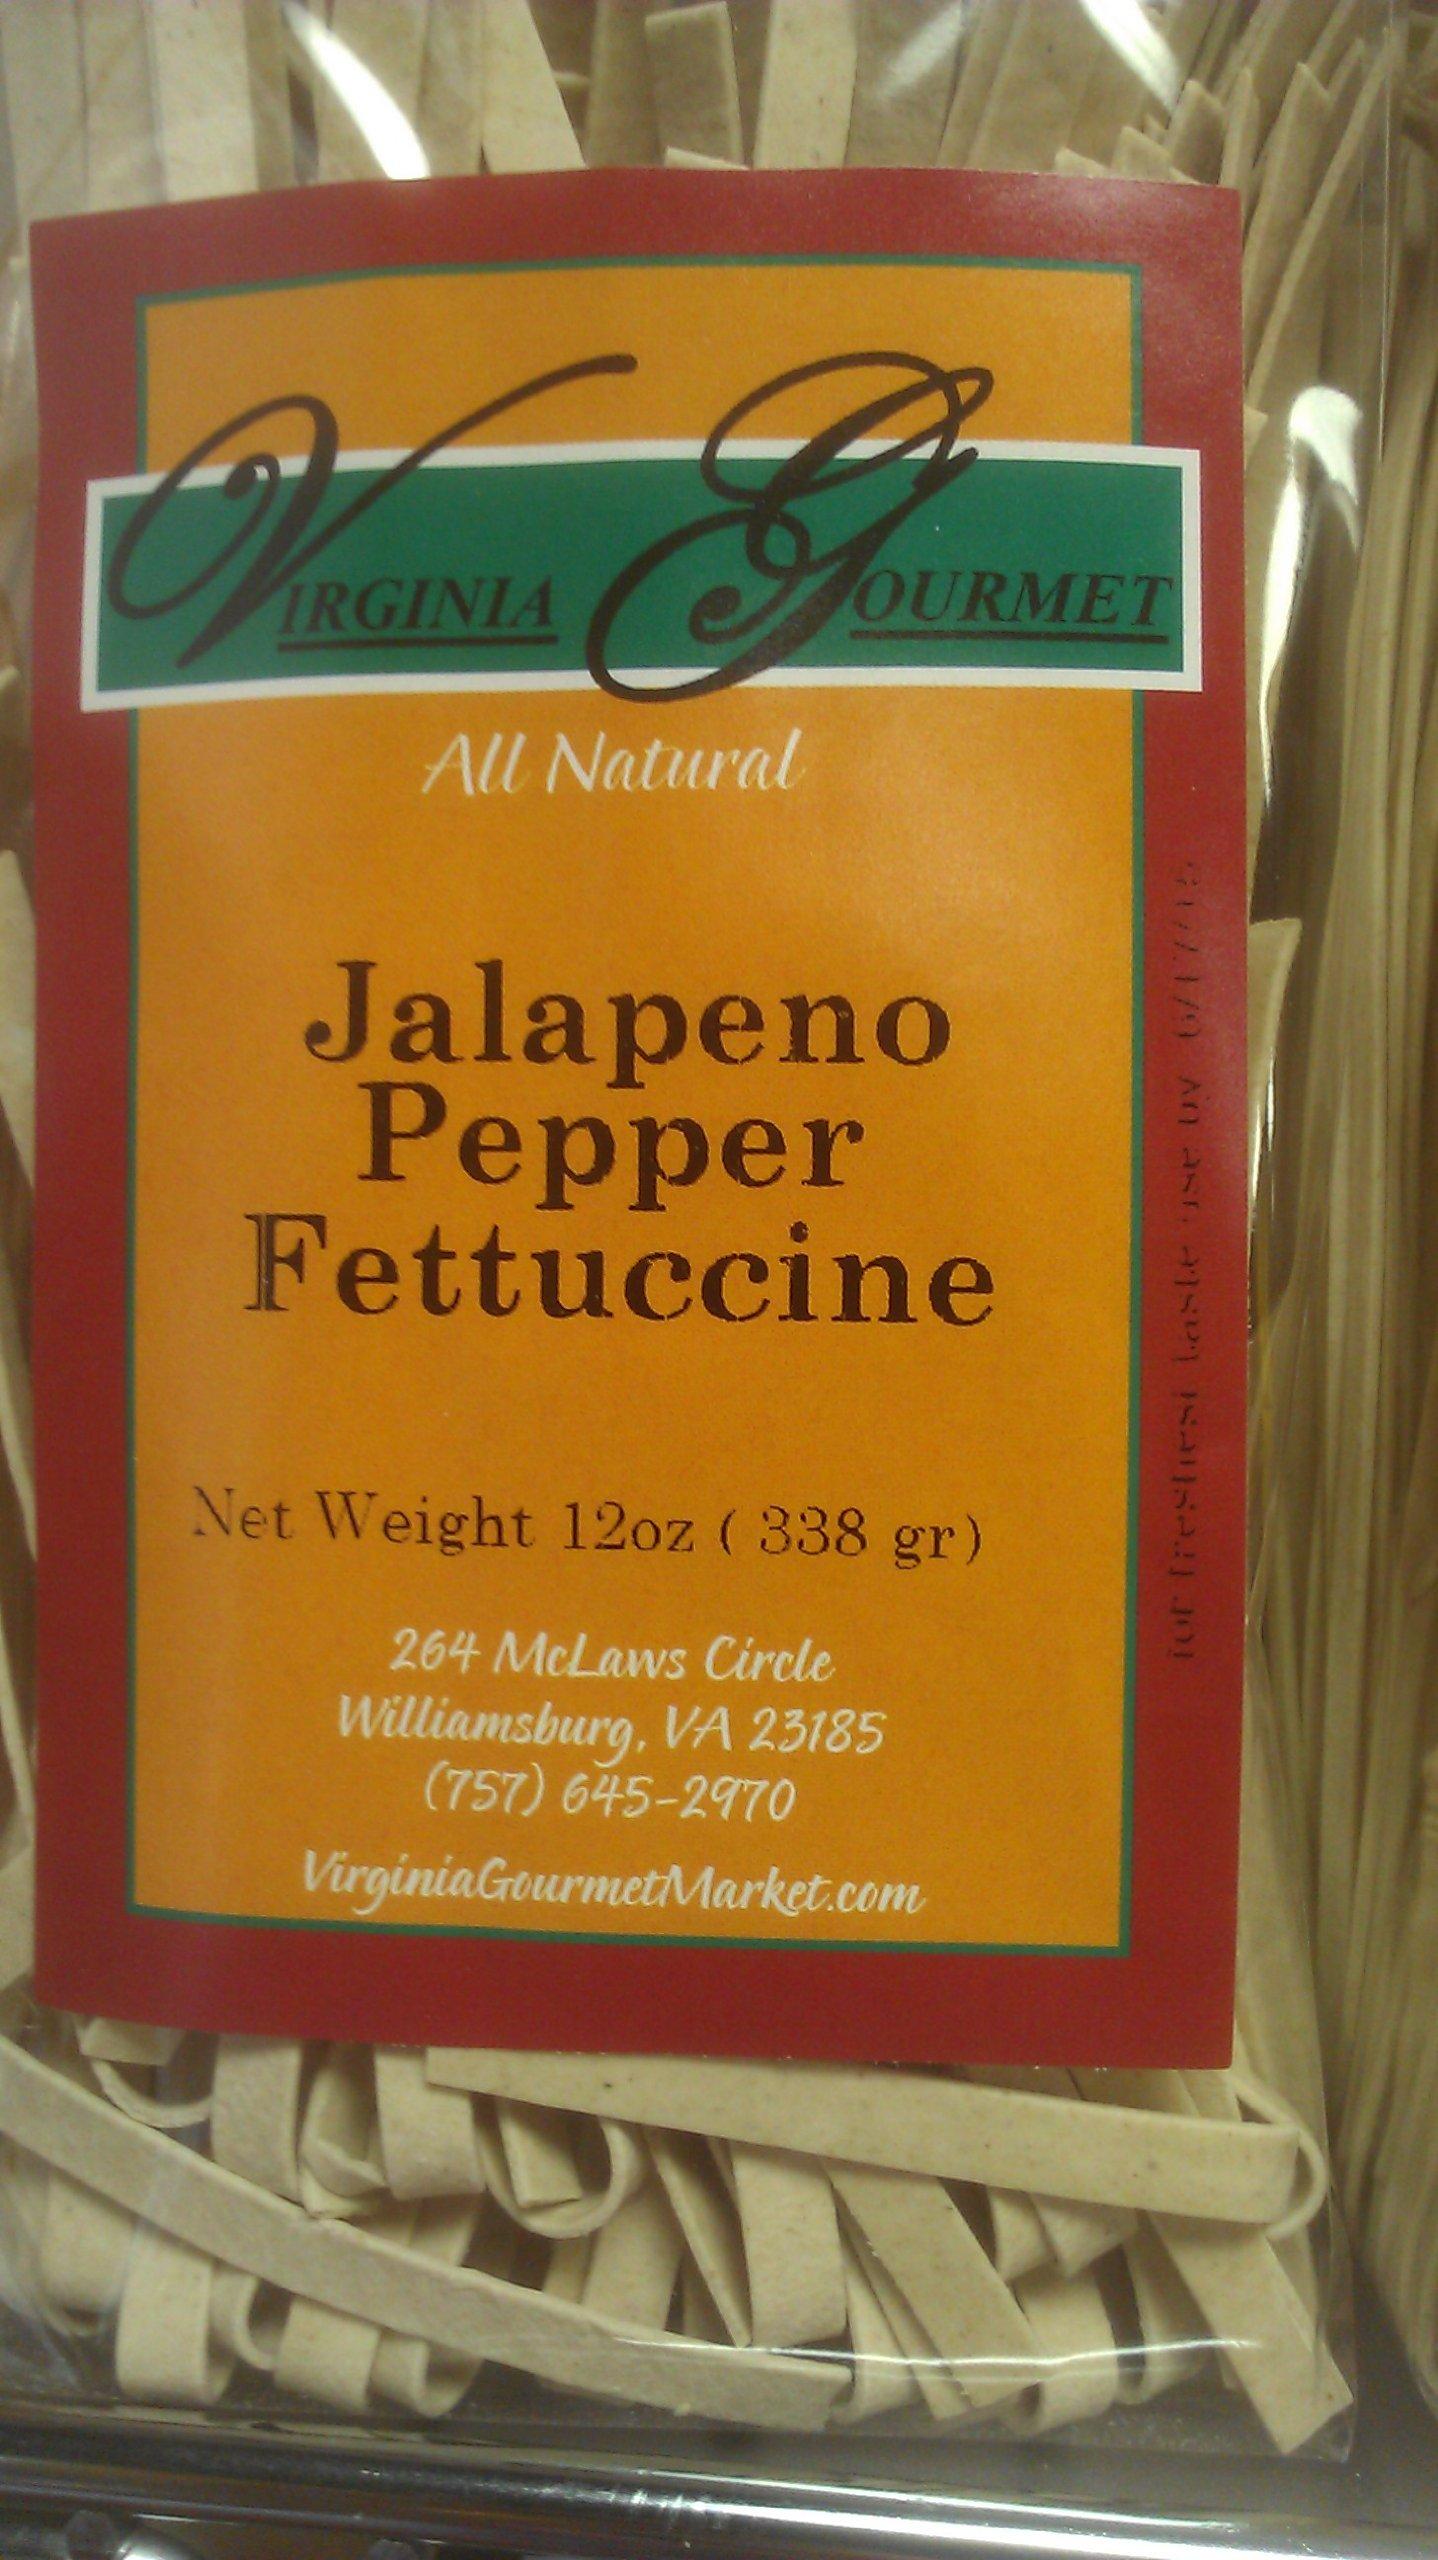 Virginia Gourmet Jalapeno Pepper Fettuccine-6 PACK- All Natural Vegan Pasta Unbleached Wheat Flour , Jalapeno pepper, Water